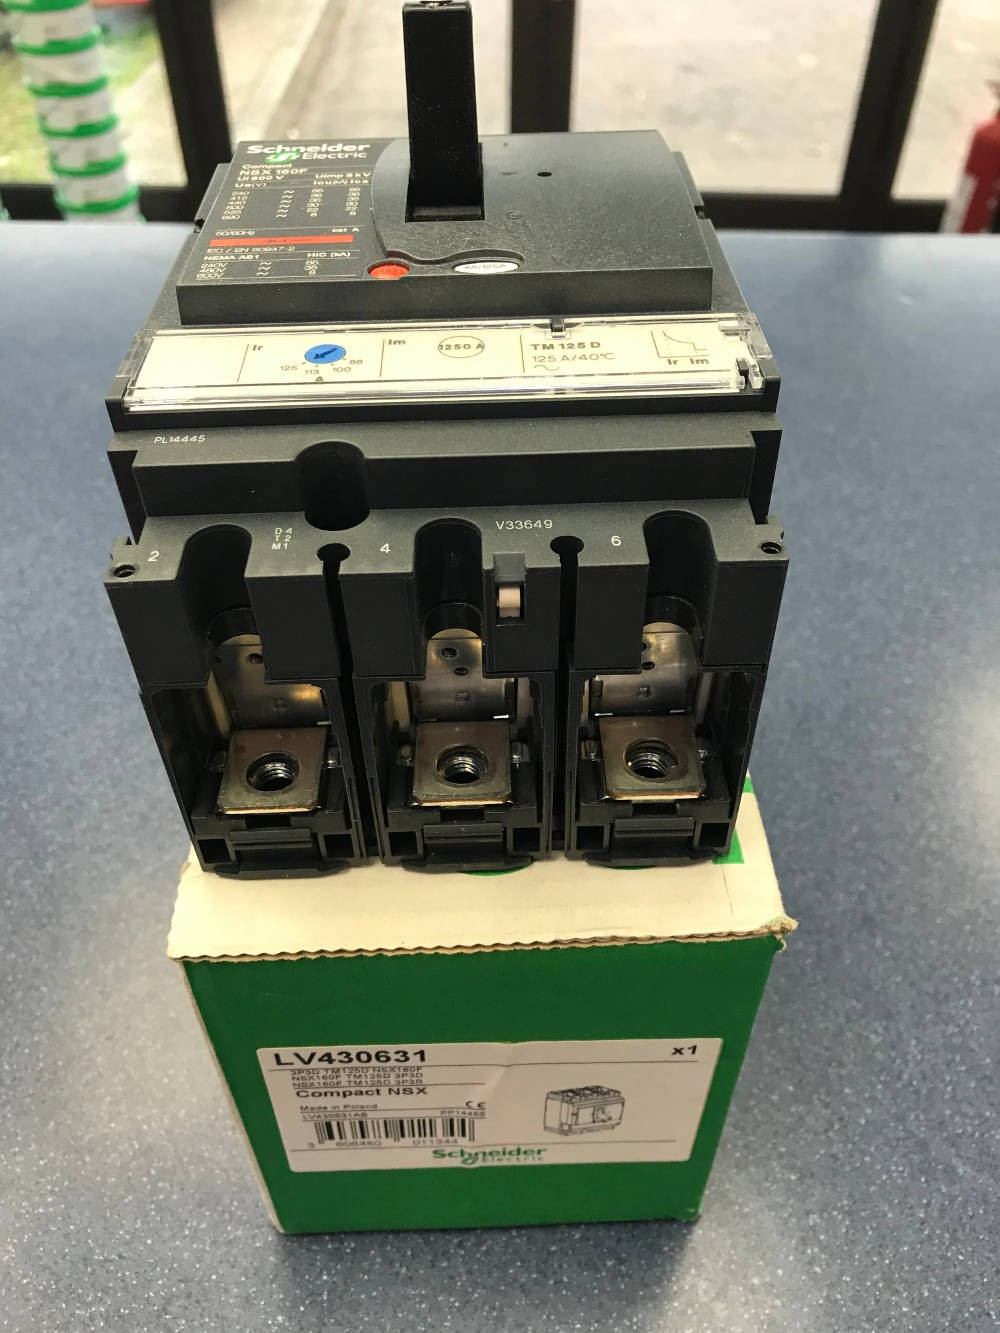 SCHNEIDER LV430631, MCCB, Compact NSX160F TP 3d, TM-D Thermal Magnetic, Size: 125A 36kA